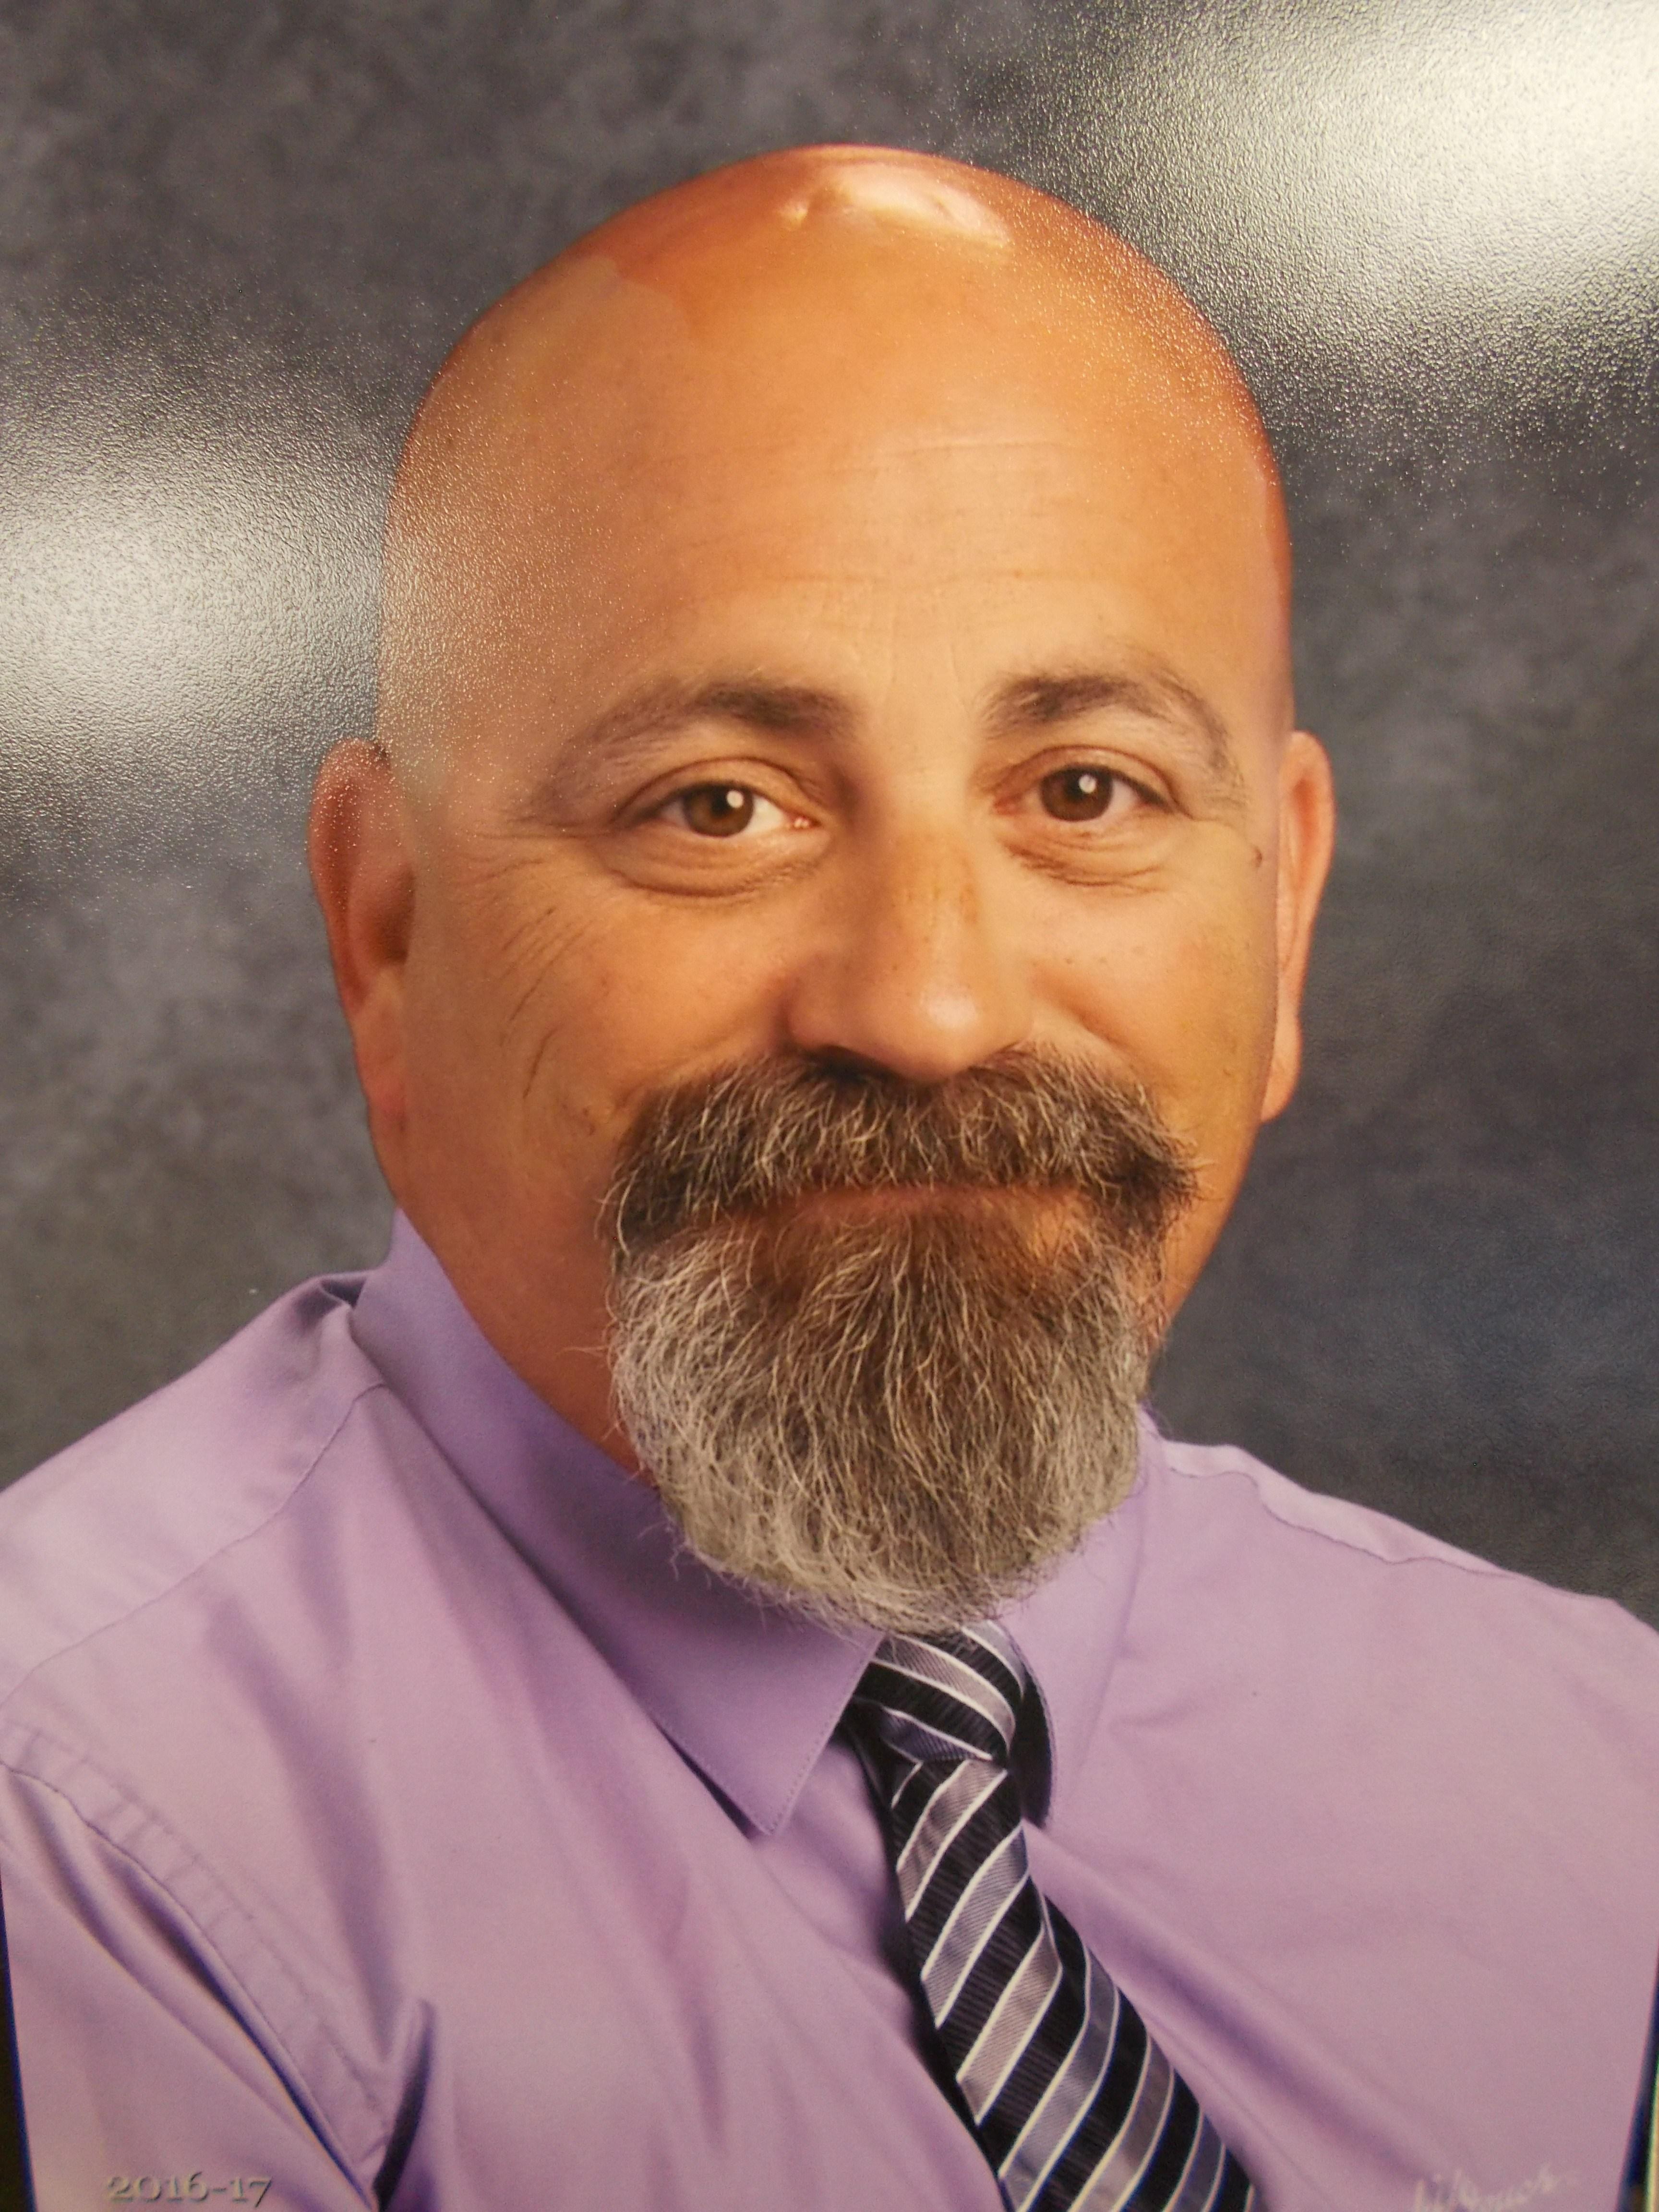 Mr. Lynch, Principal